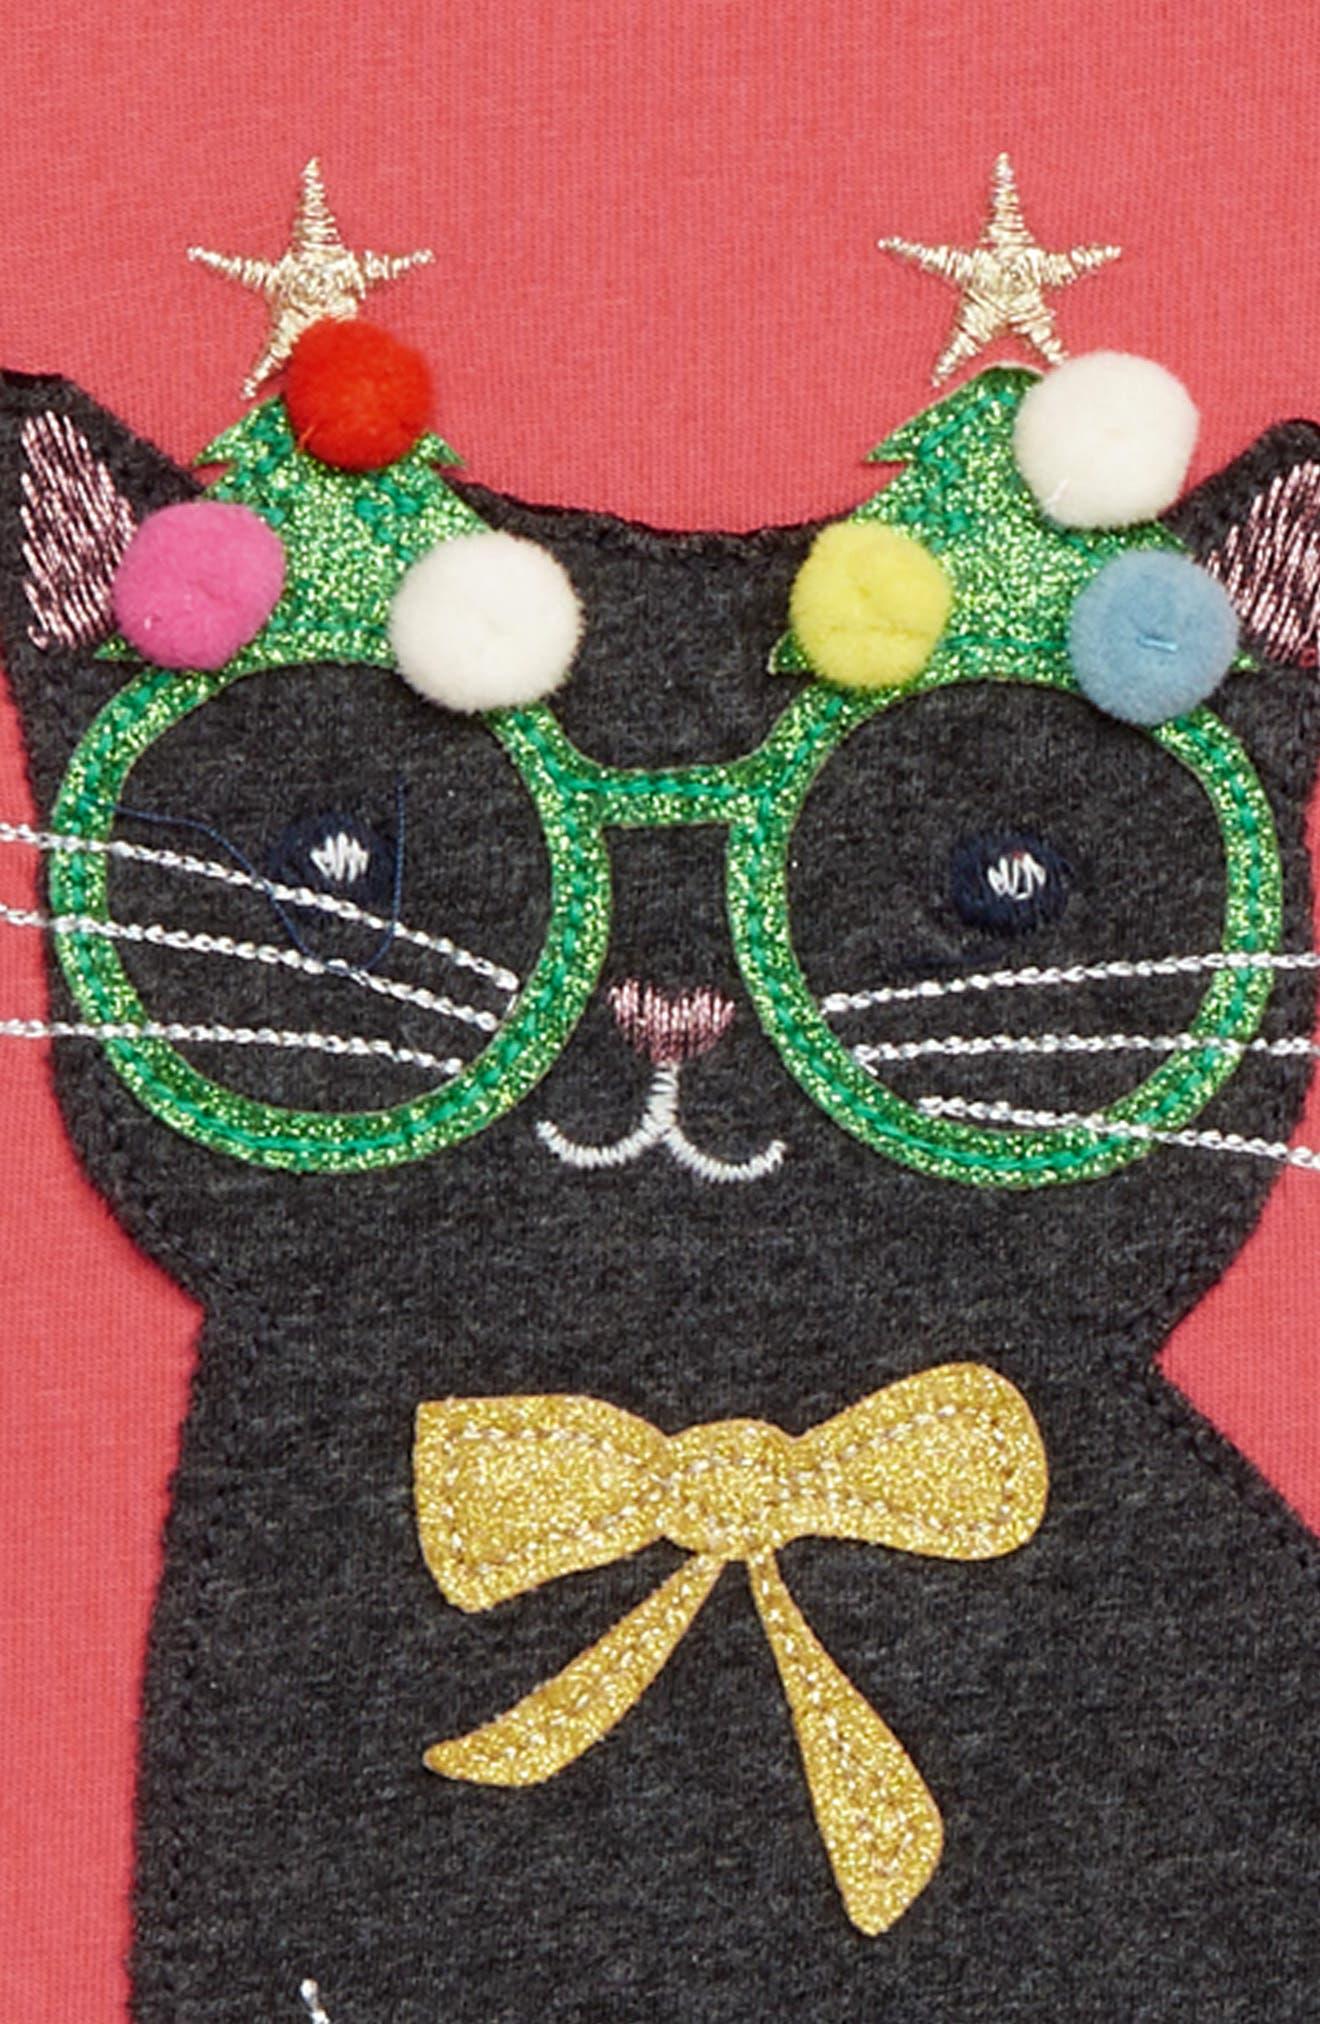 Mini Boden Festive Animals Tee,                             Alternate thumbnail 2, color,                             PNK ROSETTE PINK CAT